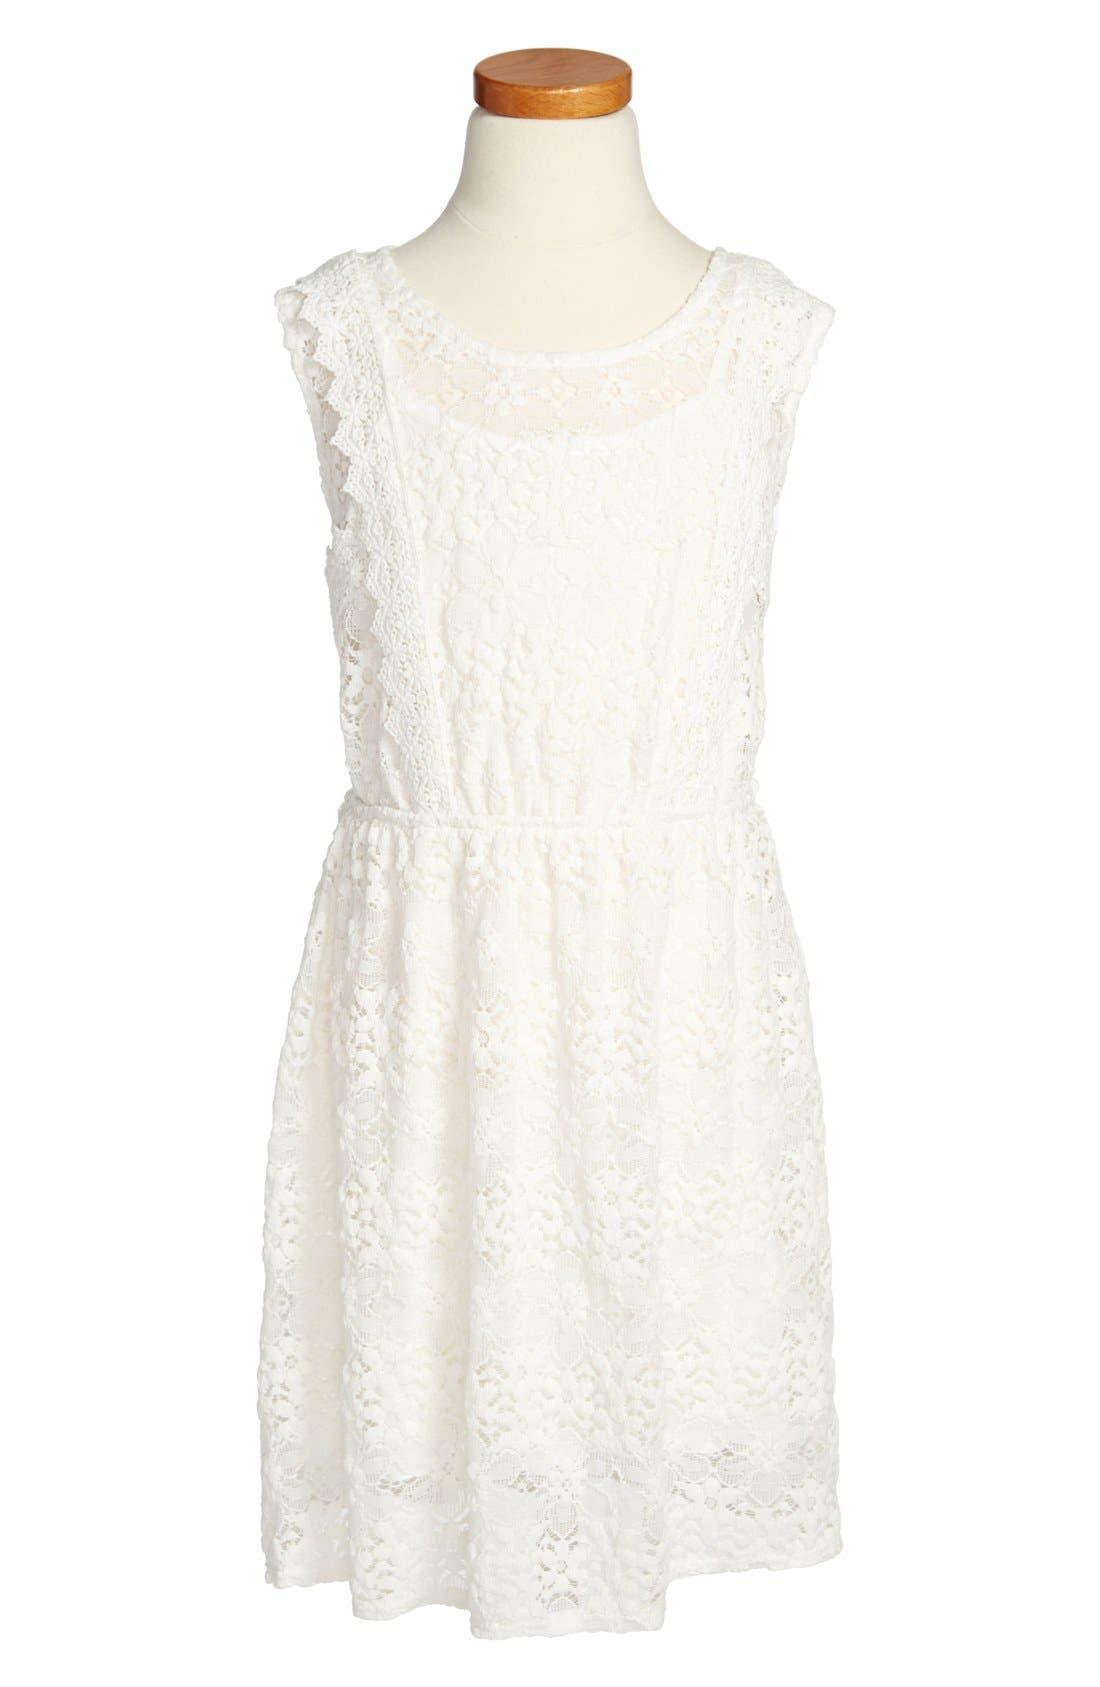 Main Image - Kiddo Ivory Lace Dress (Big Girls)